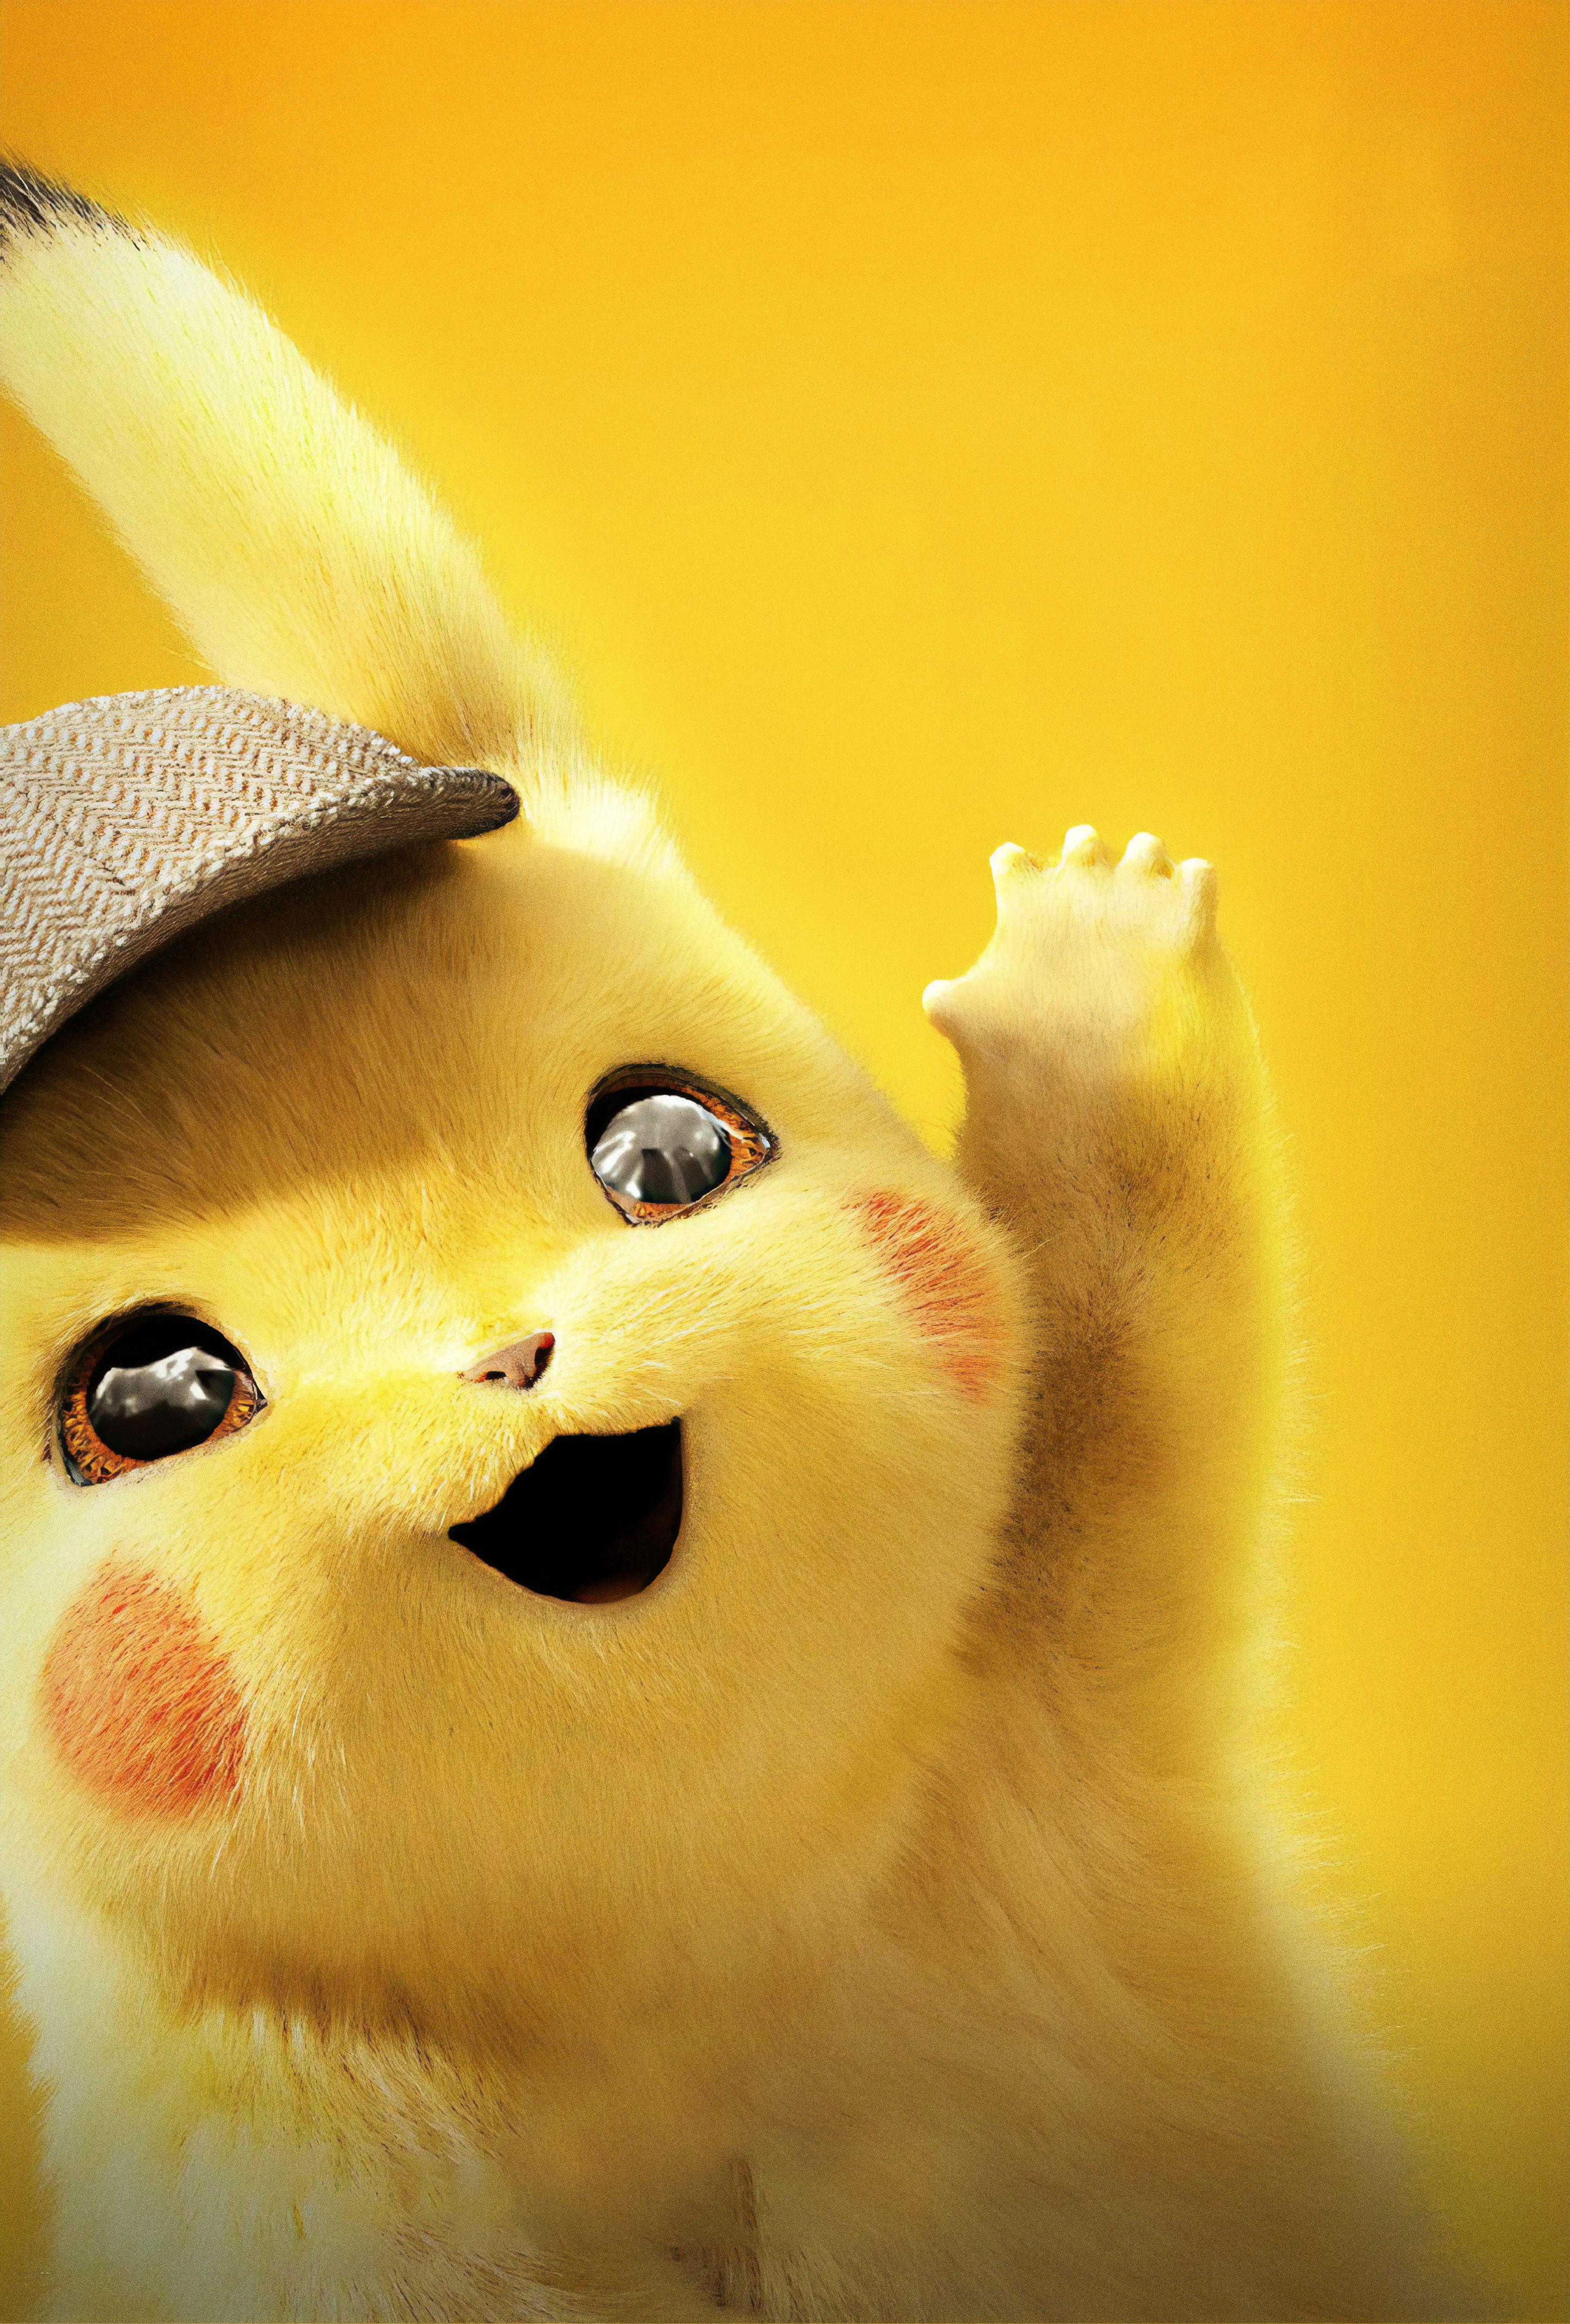 Detective Pikachu Wallpaper, HD Movies 4K Wallpapers ...